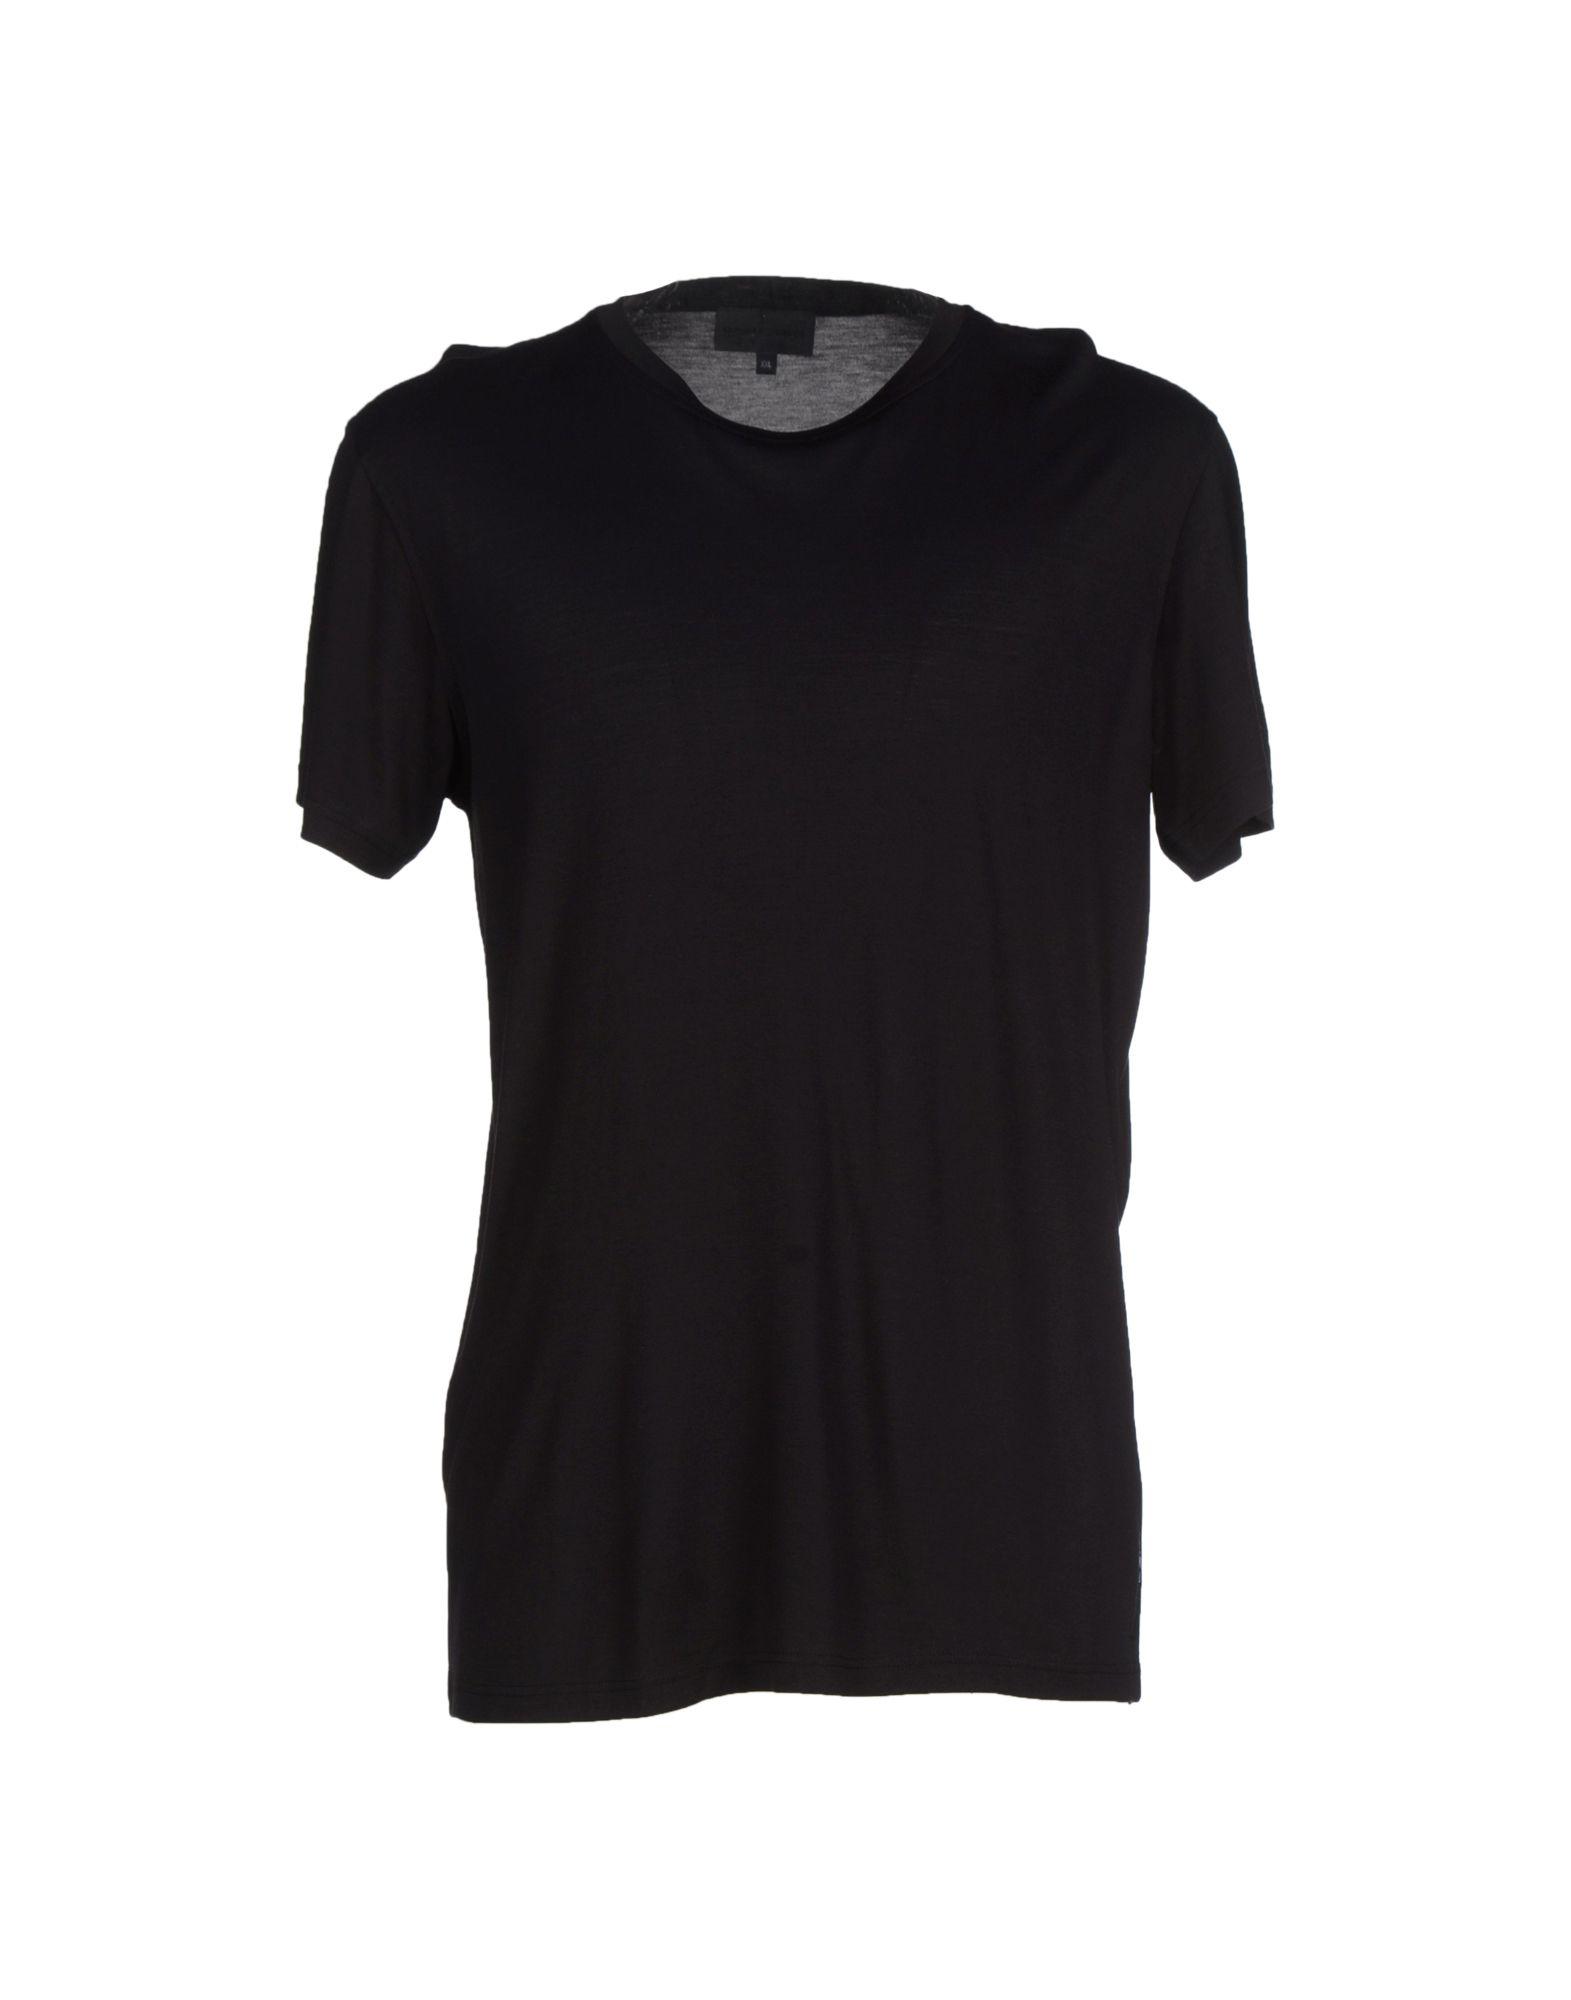 Emporio Armani T Shirt In Black For Men Lyst